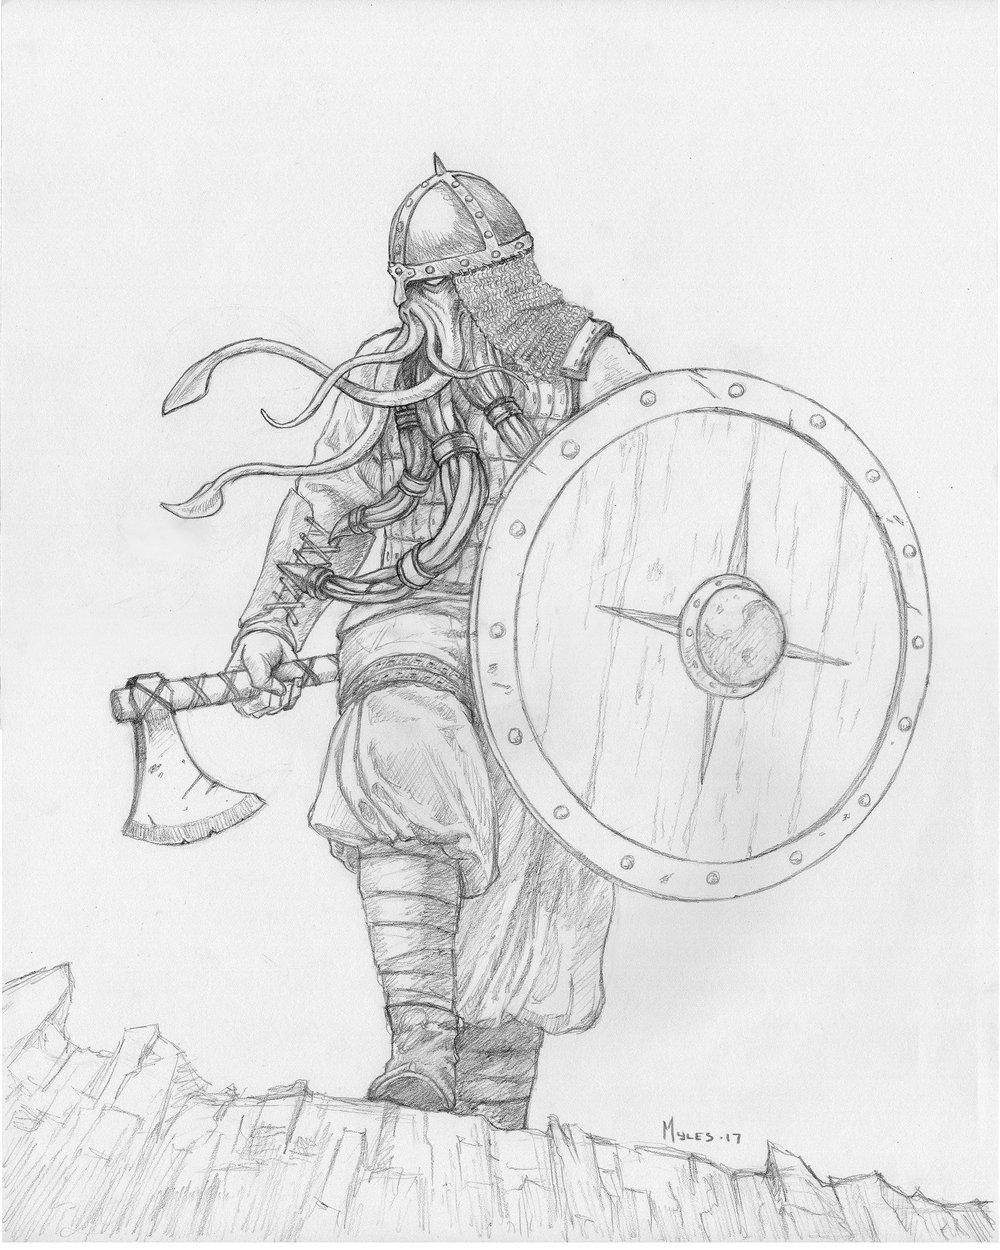 UlnOtThrod_Sketch.jpg